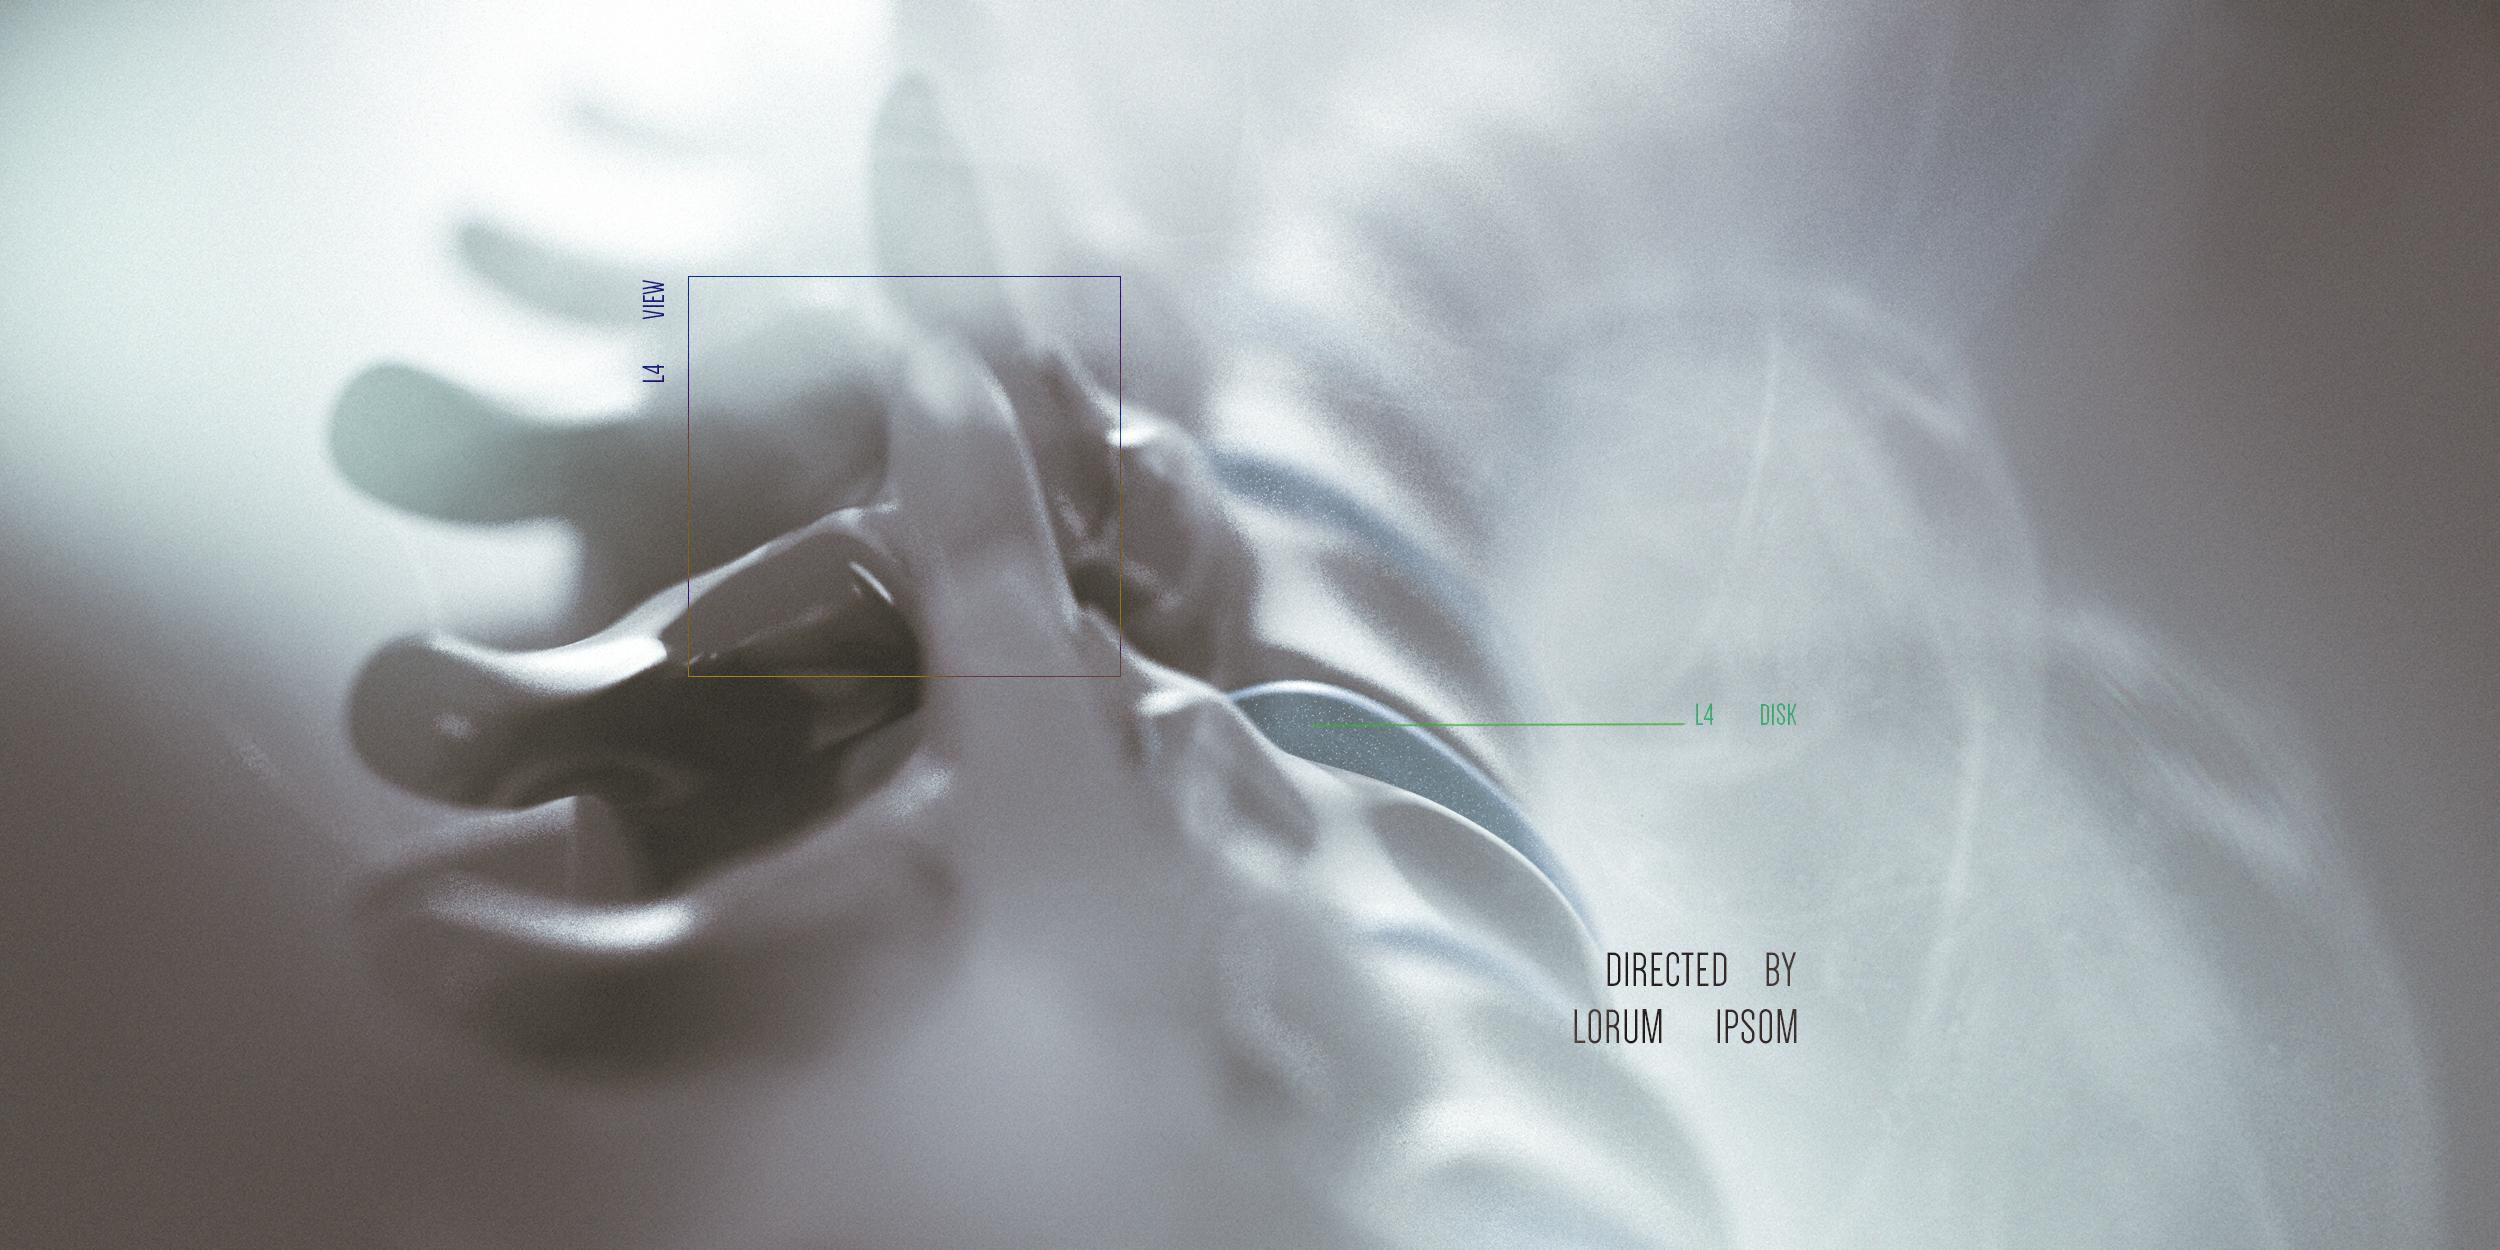 04-A1OU-SKELETAL-DRAWING-01-5-4.jpg